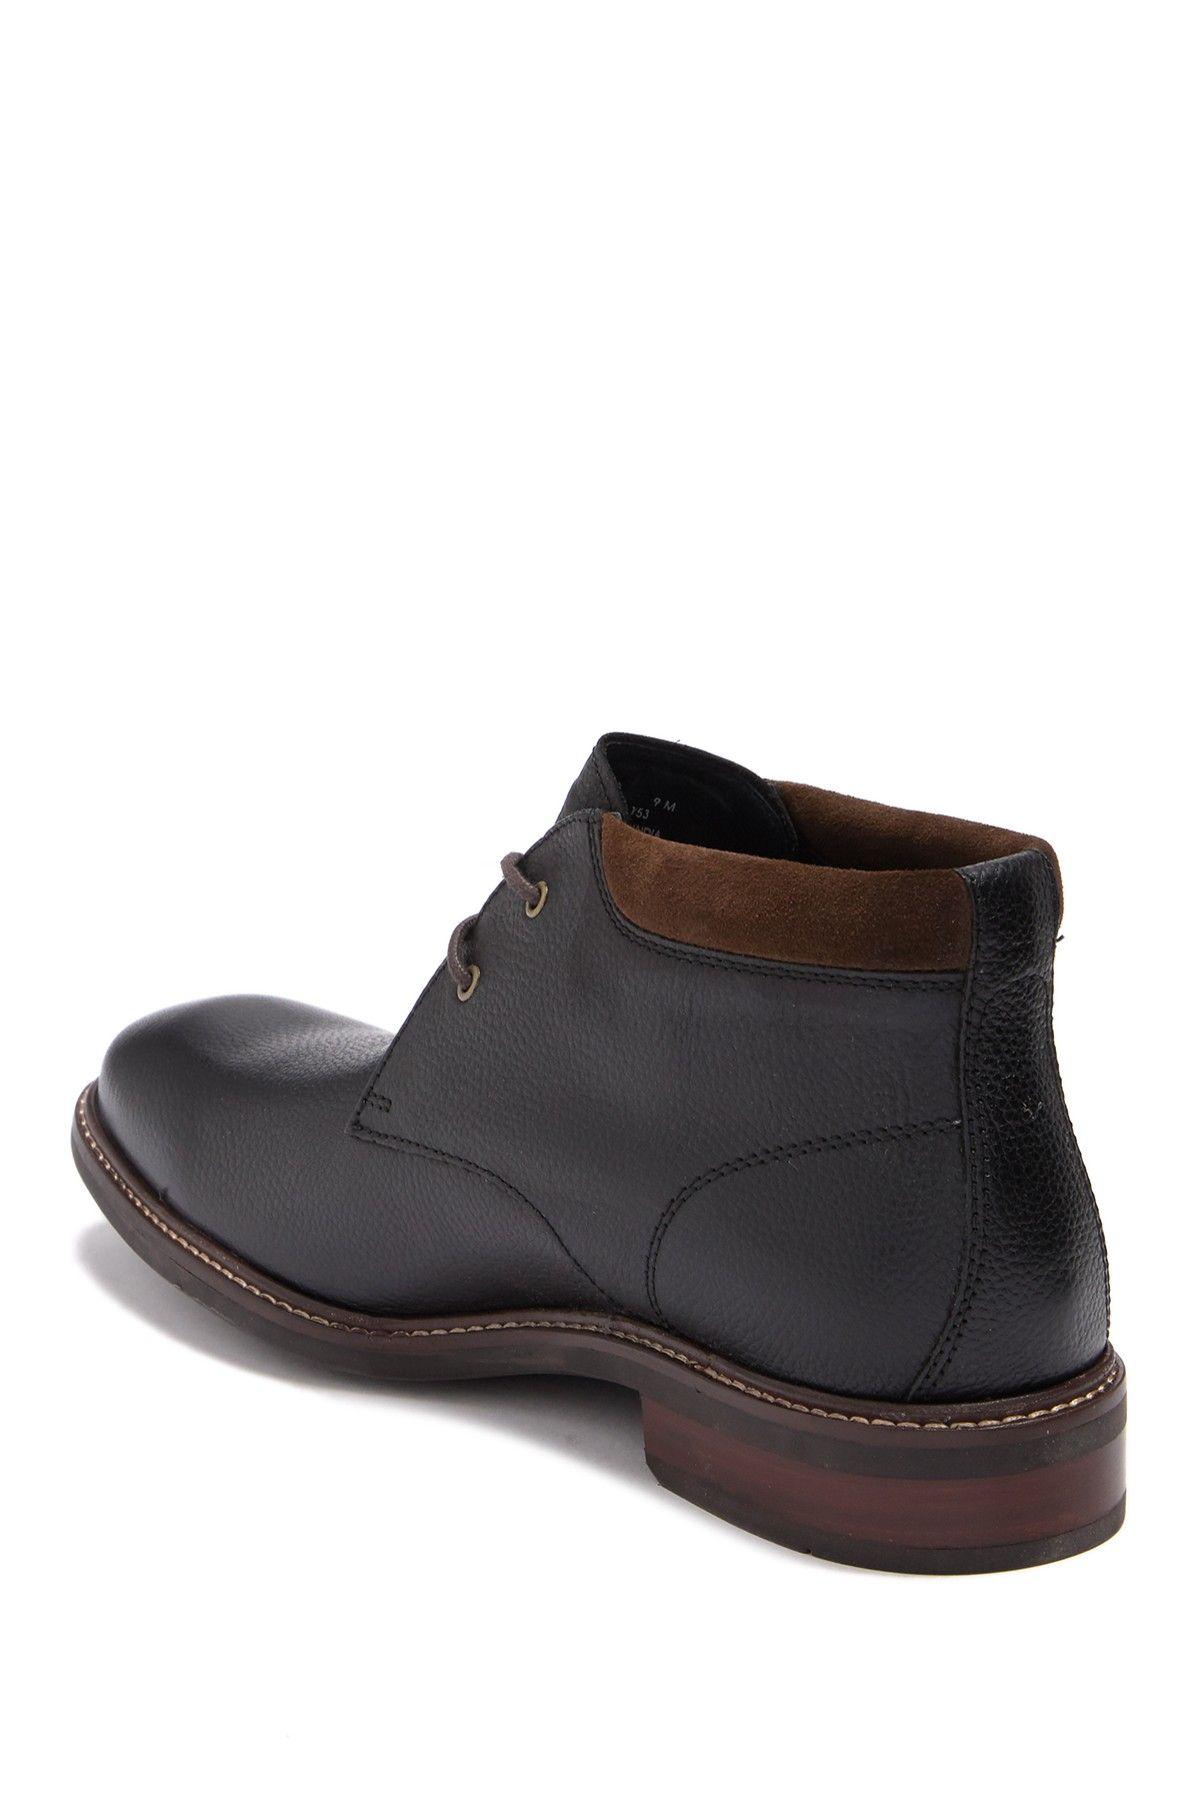 Cole Haan Watson Chukka II Leather Boot